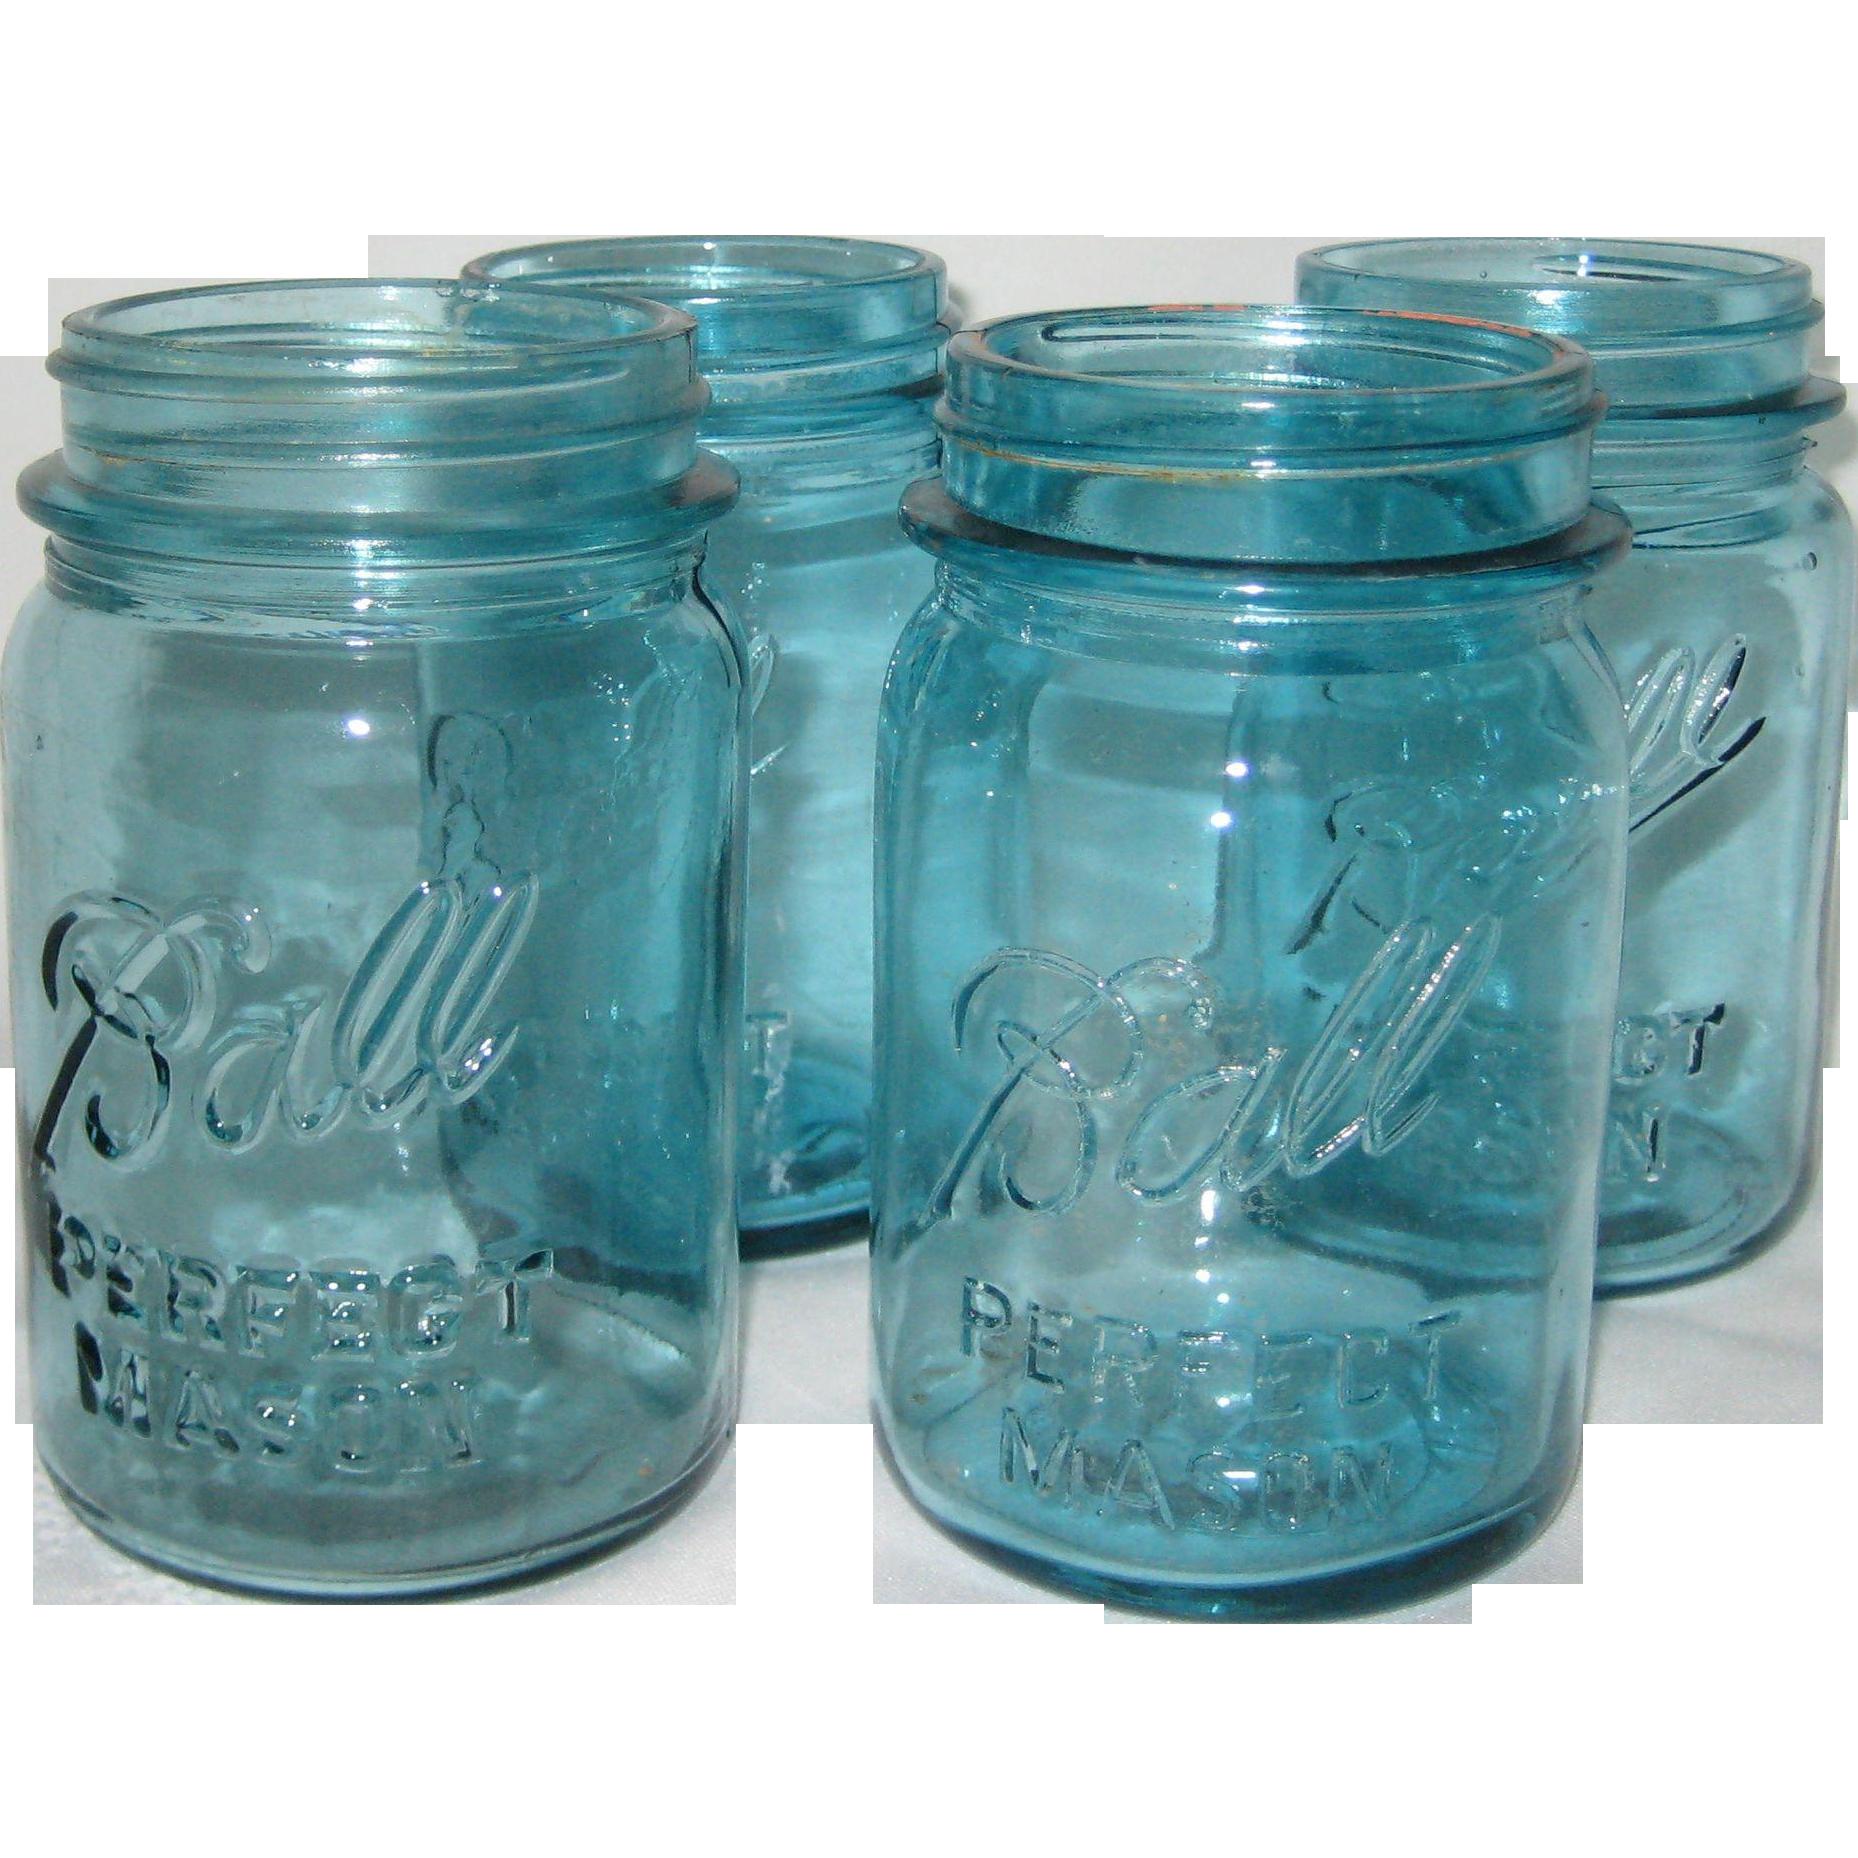 Four Ball Perfect Mason Aqua Blue Pint Canning or Fruit Jars - 1923 - 1962